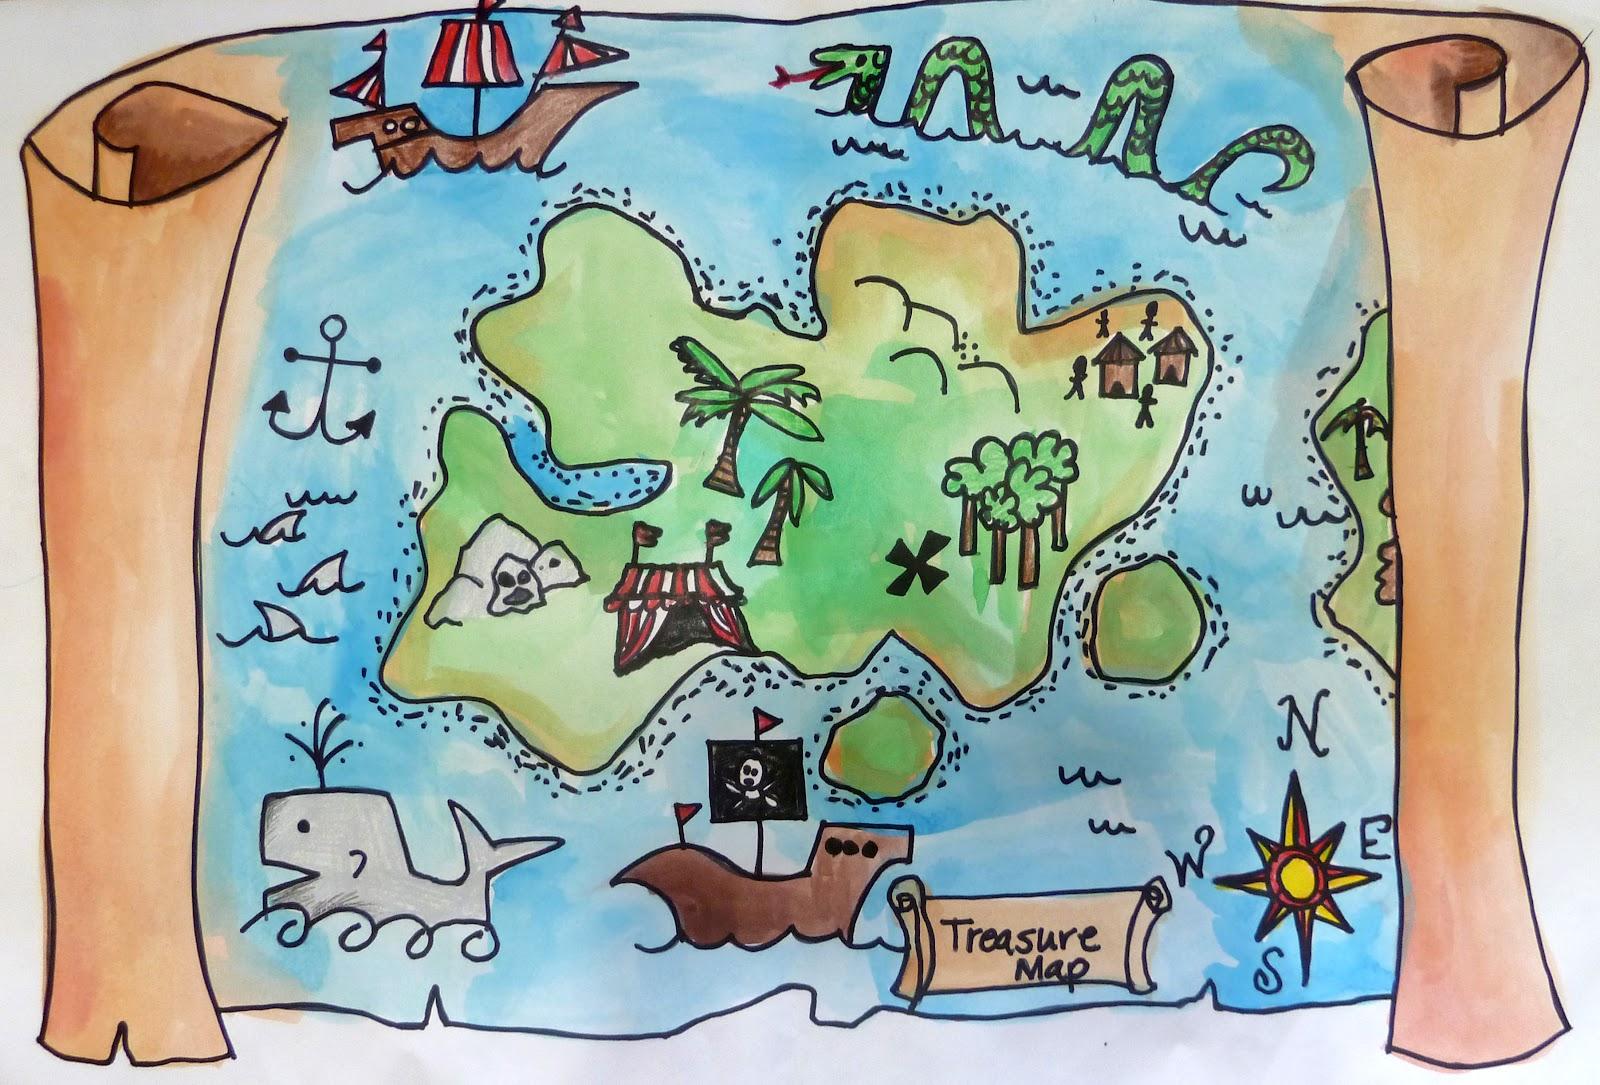 Treasure clipart treasure map Keywords Long Suggestions  Related